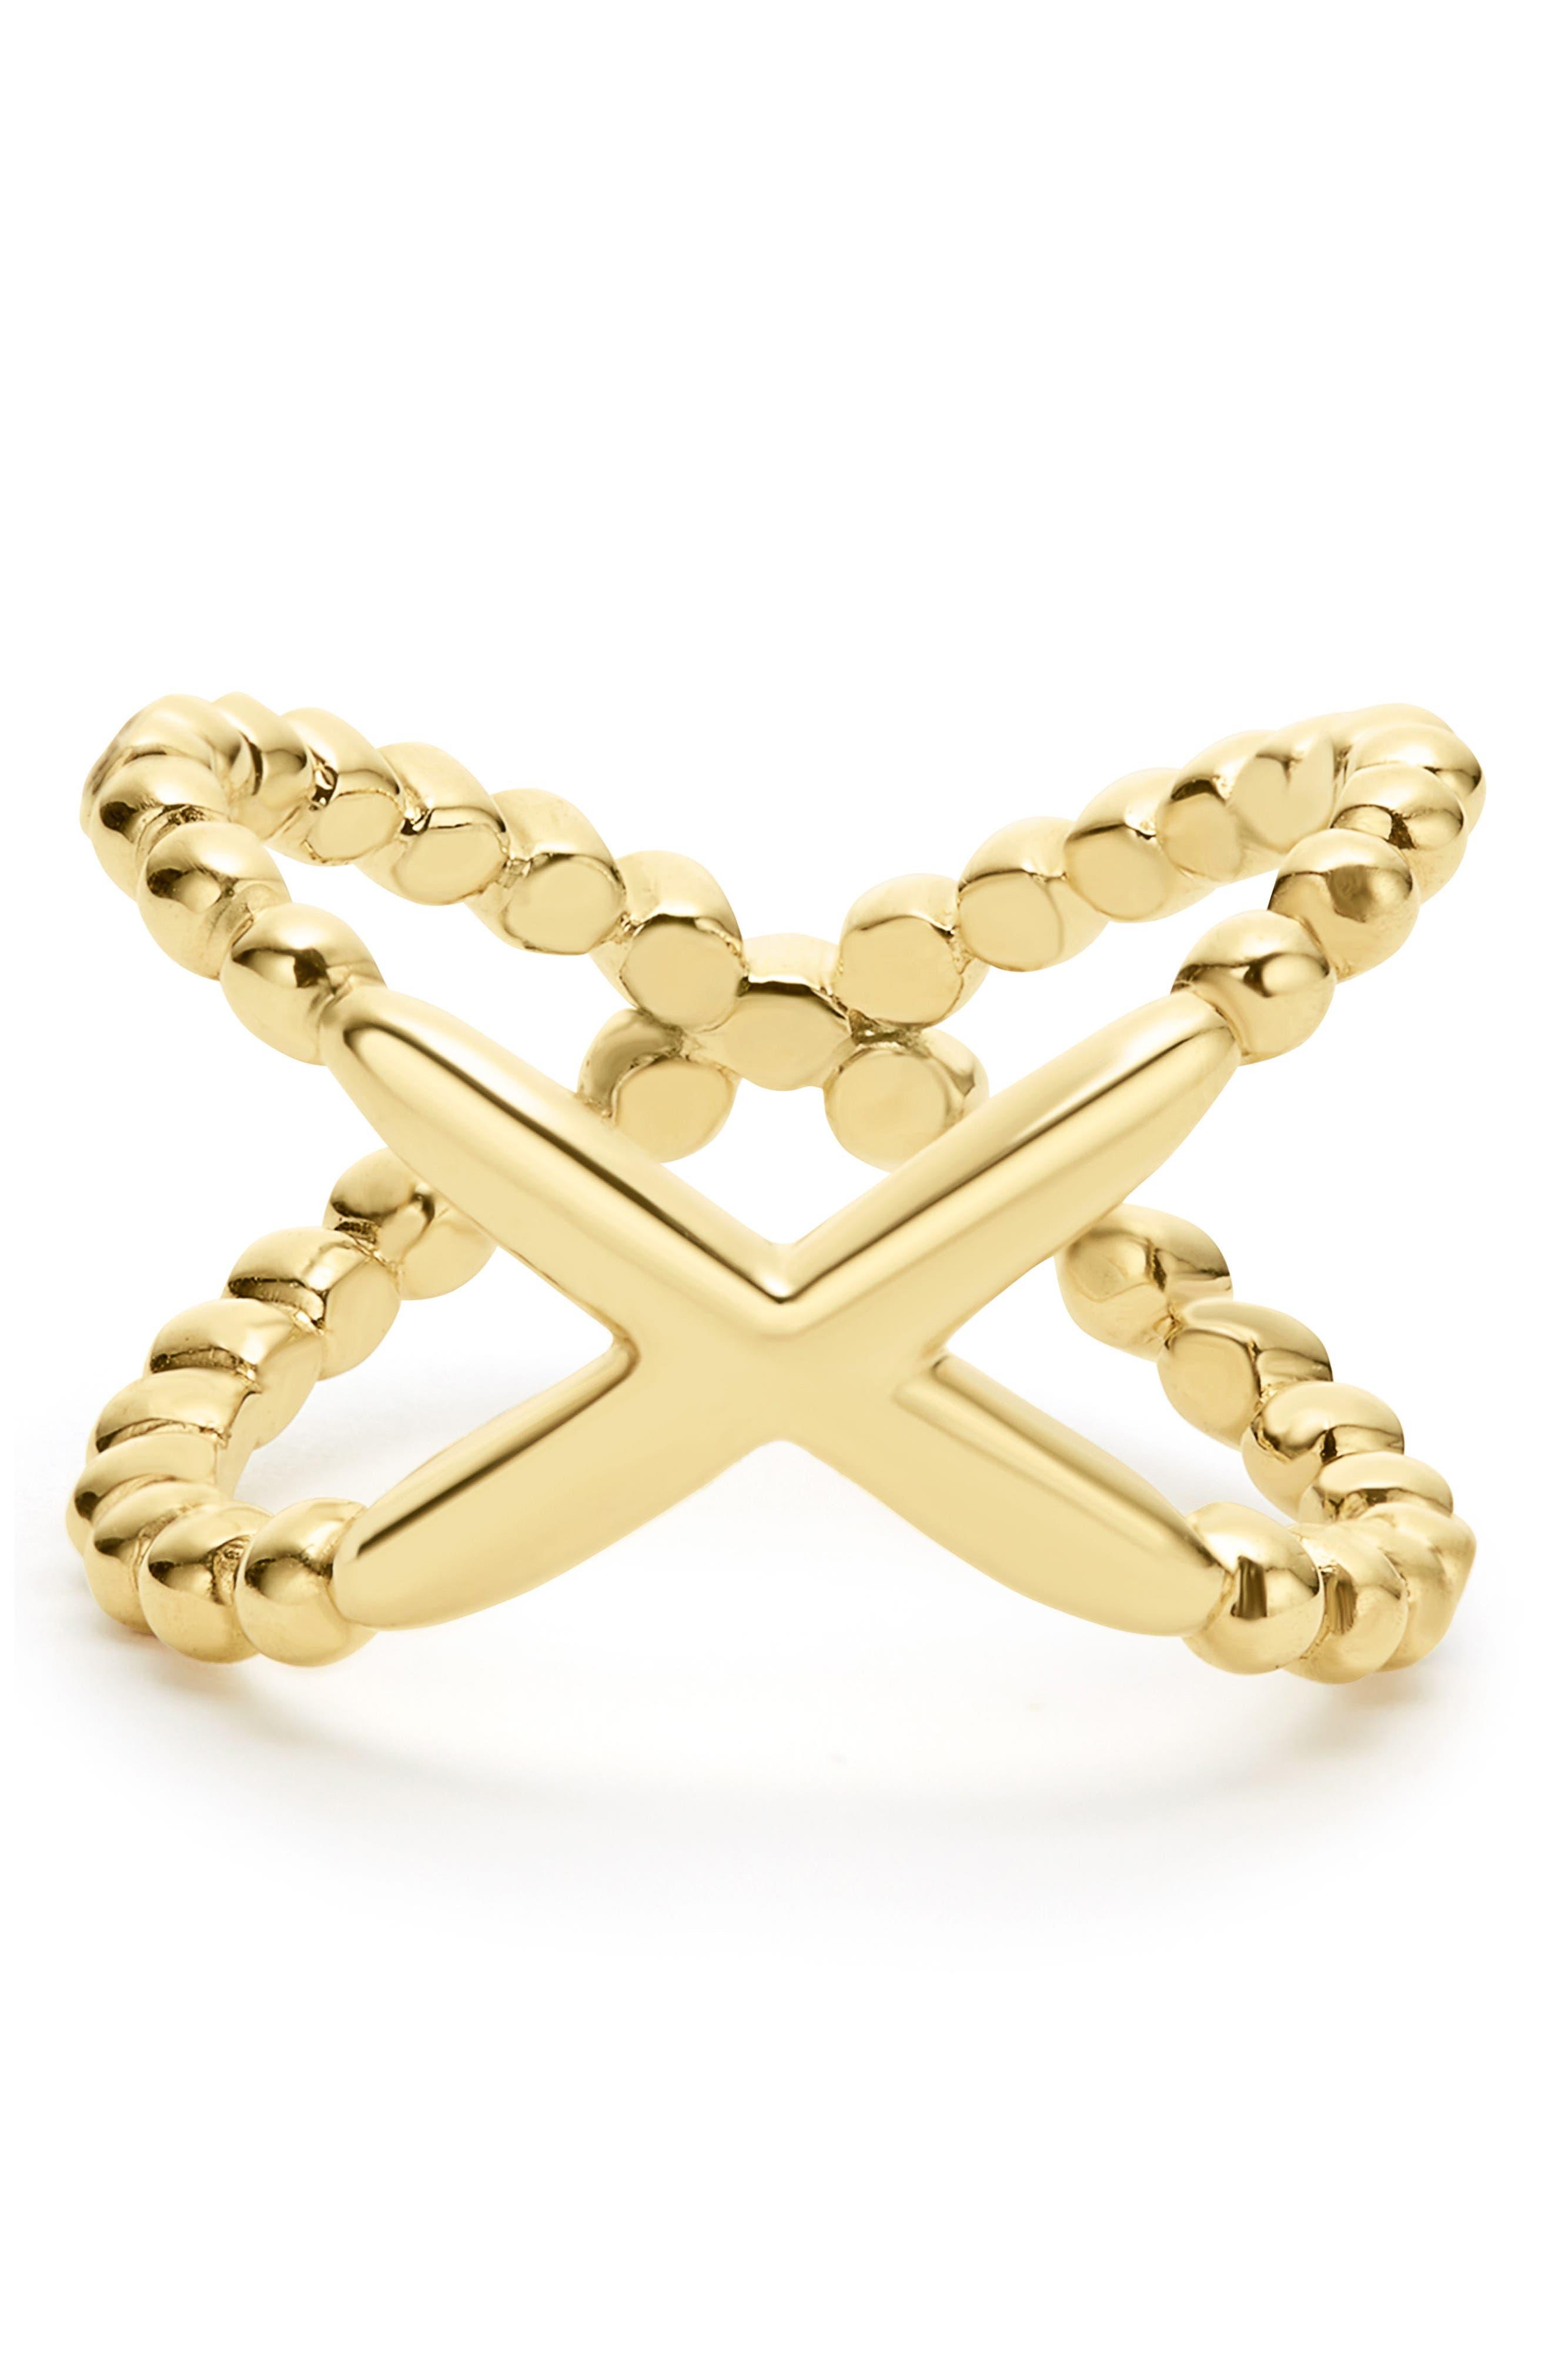 Caviar Crisscross Ring,                             Alternate thumbnail 4, color,                             Gold